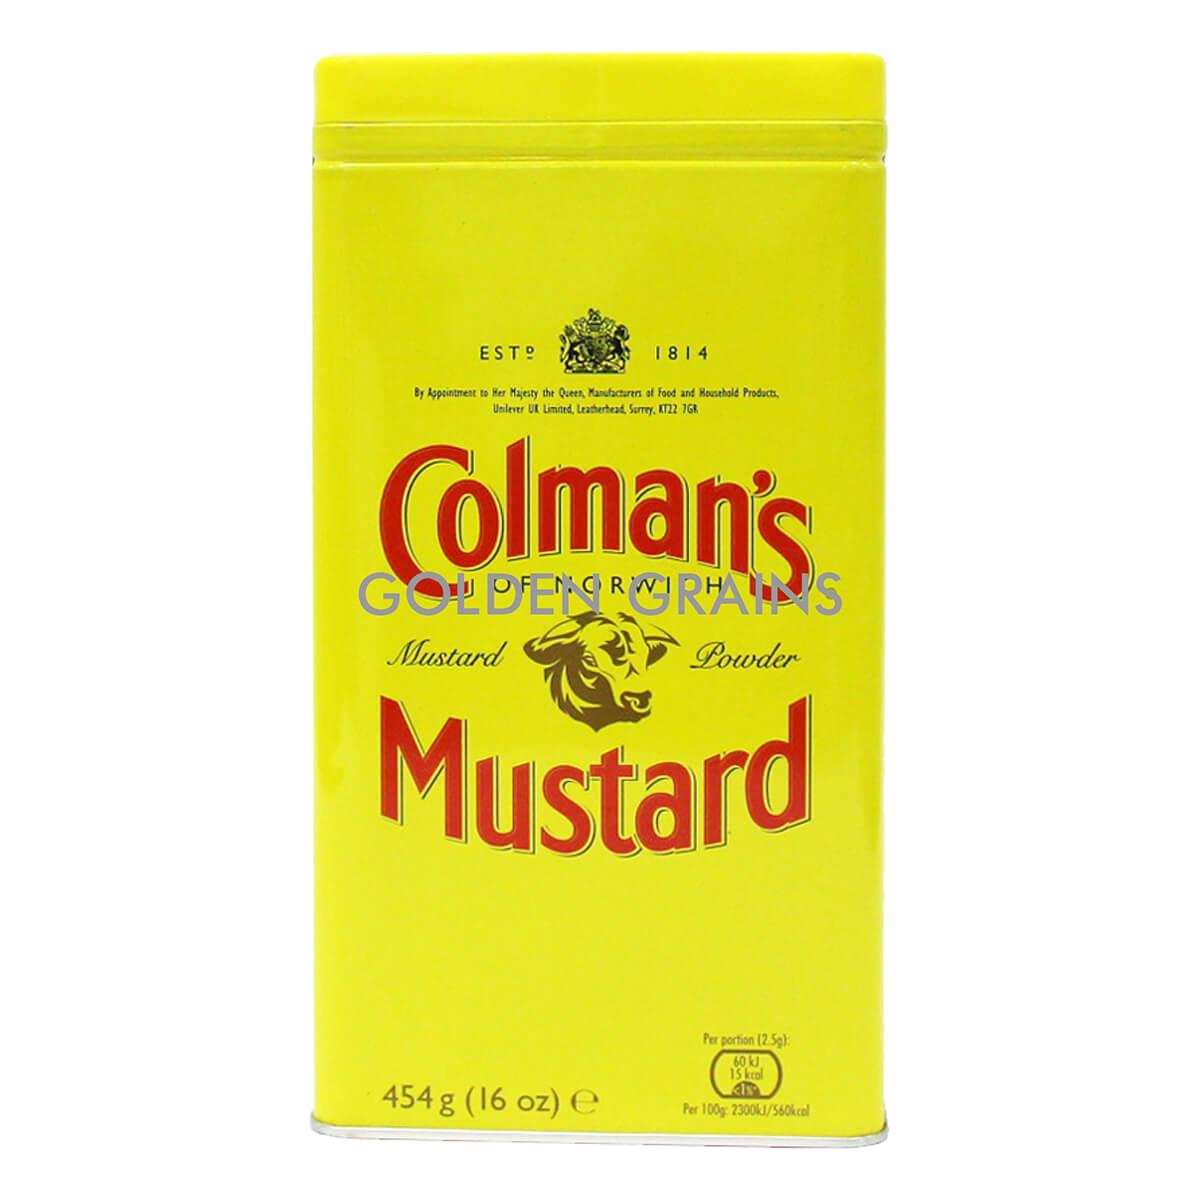 Golden Grains Colmans - Mustard 454G - Front.jpg